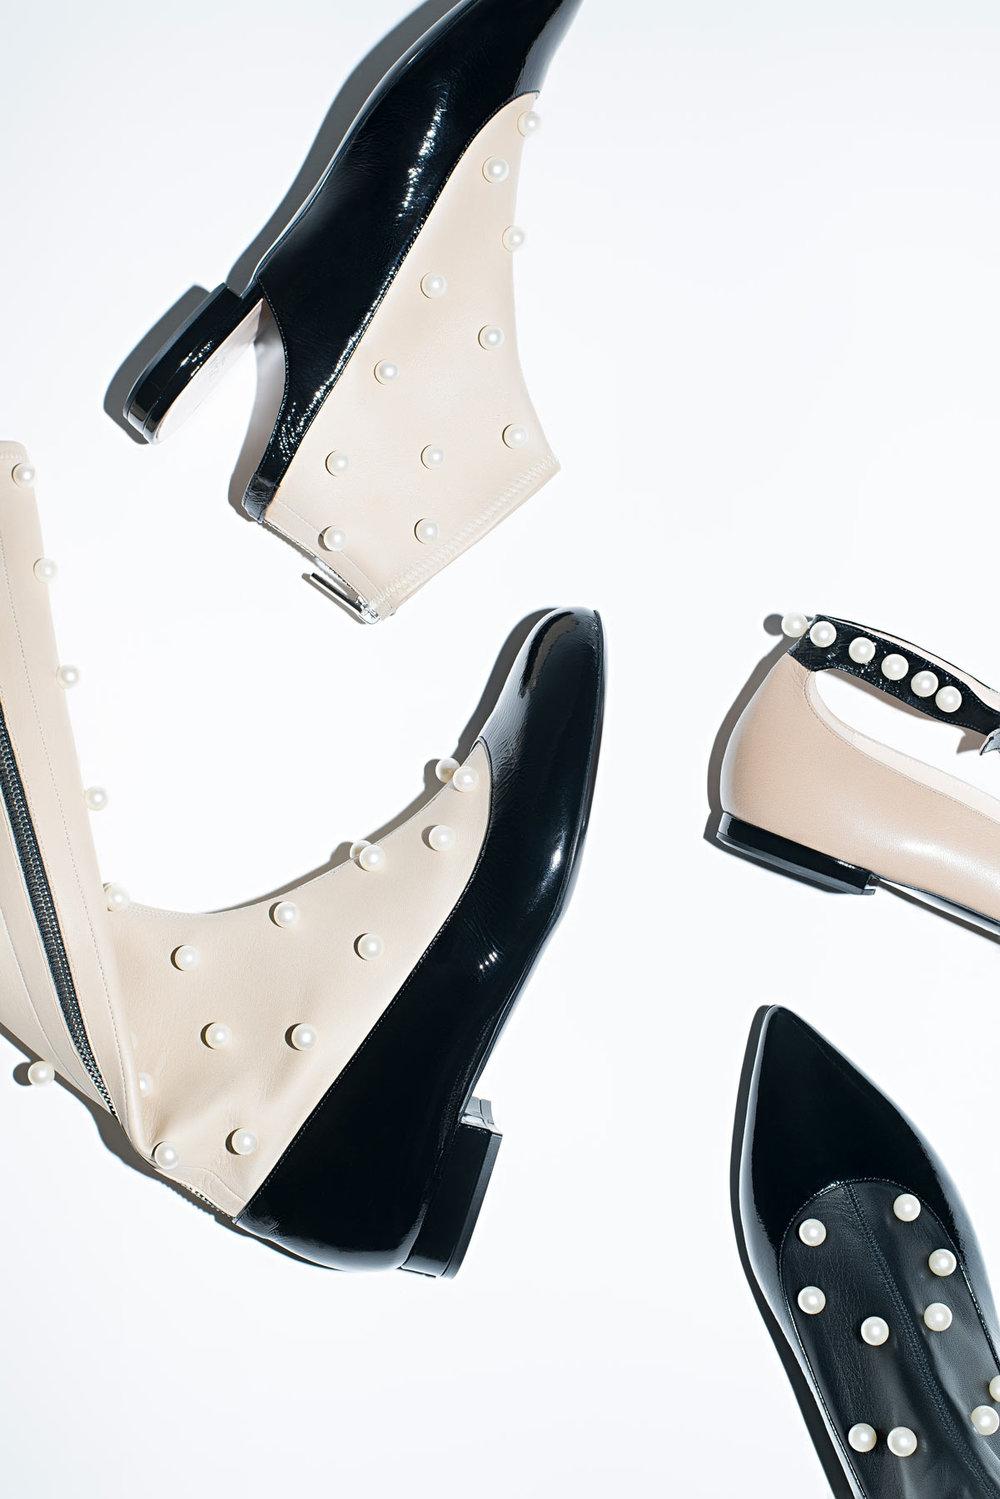 accessoire_chaussure_shoes_sac_bag_photo_photographe_nature_morte_paris_studio_photographie_eshop_sneacker_still_life_mode_luxe_122_jb_martin_01.jpg